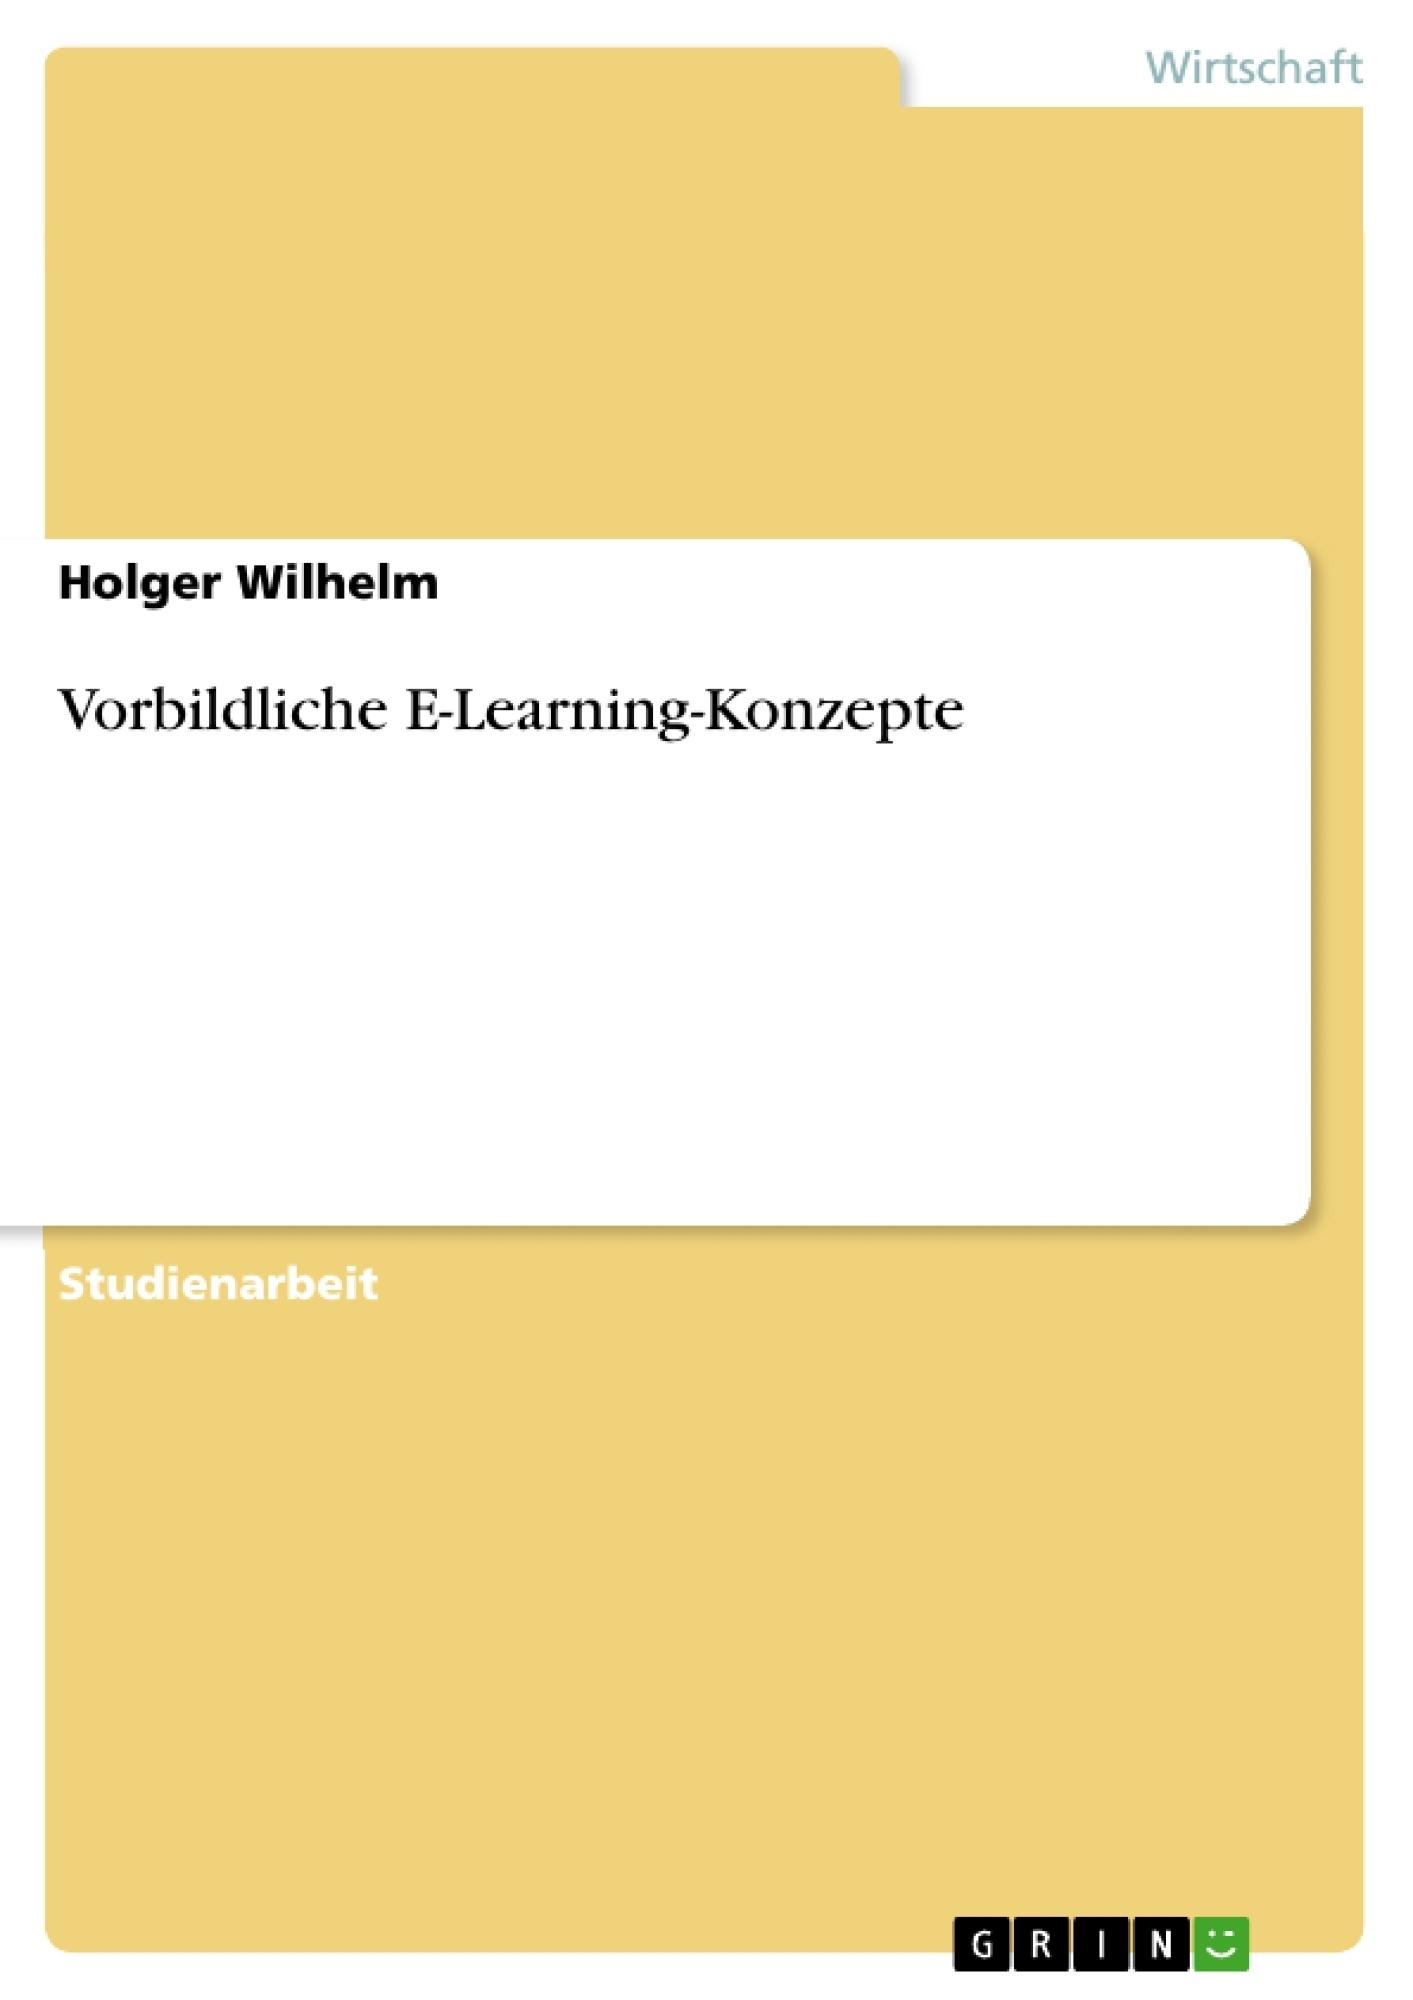 Titel: Vorbildliche E-Learning-Konzepte